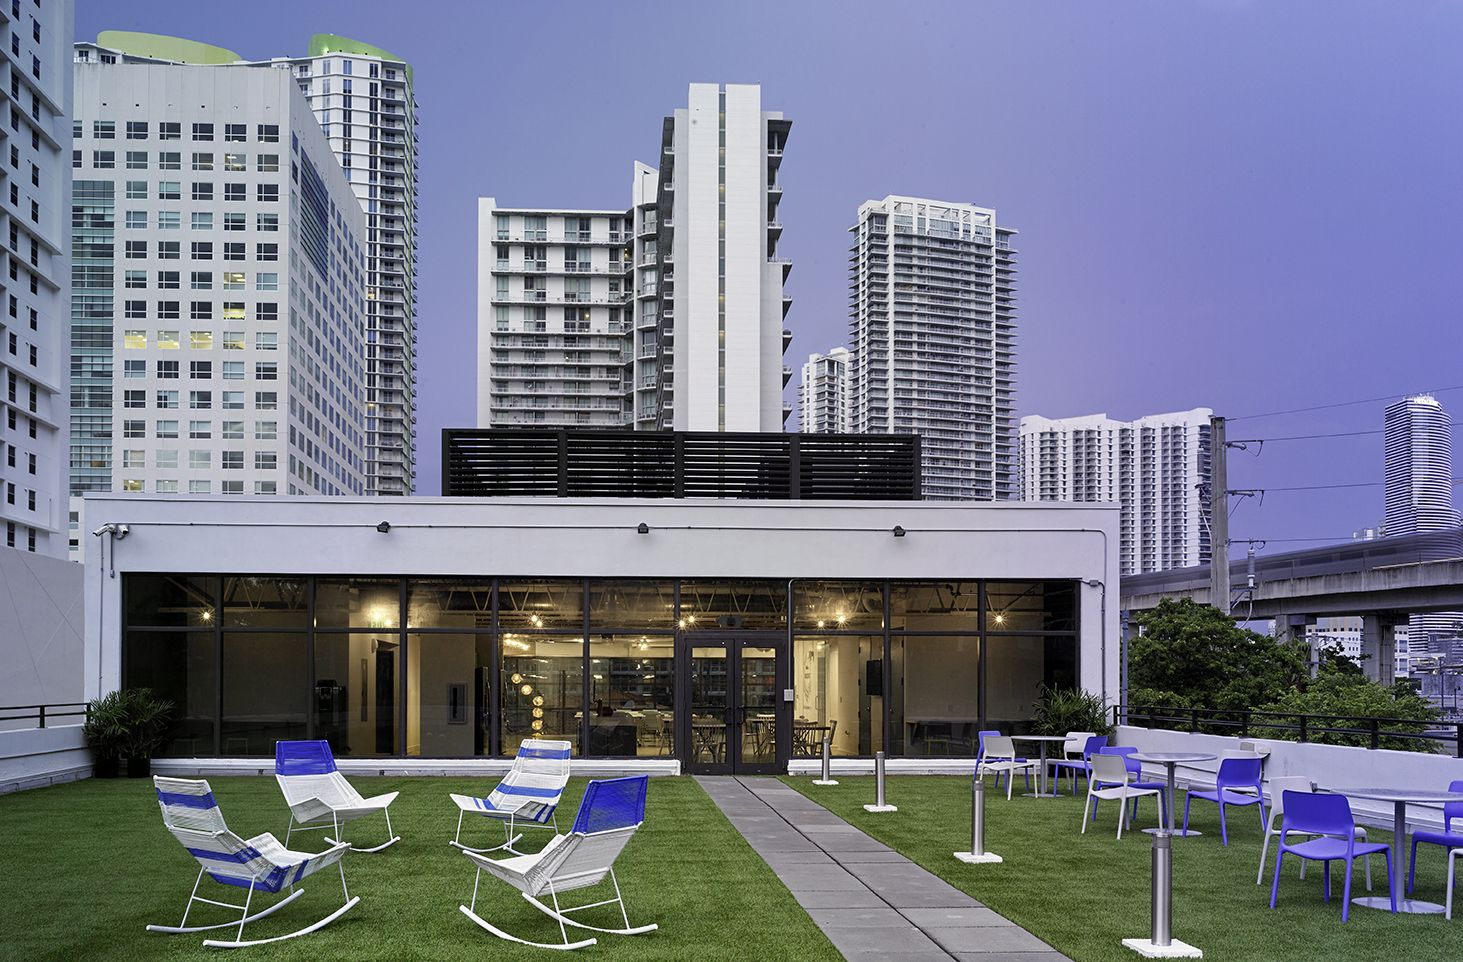 BUILDING, Miami